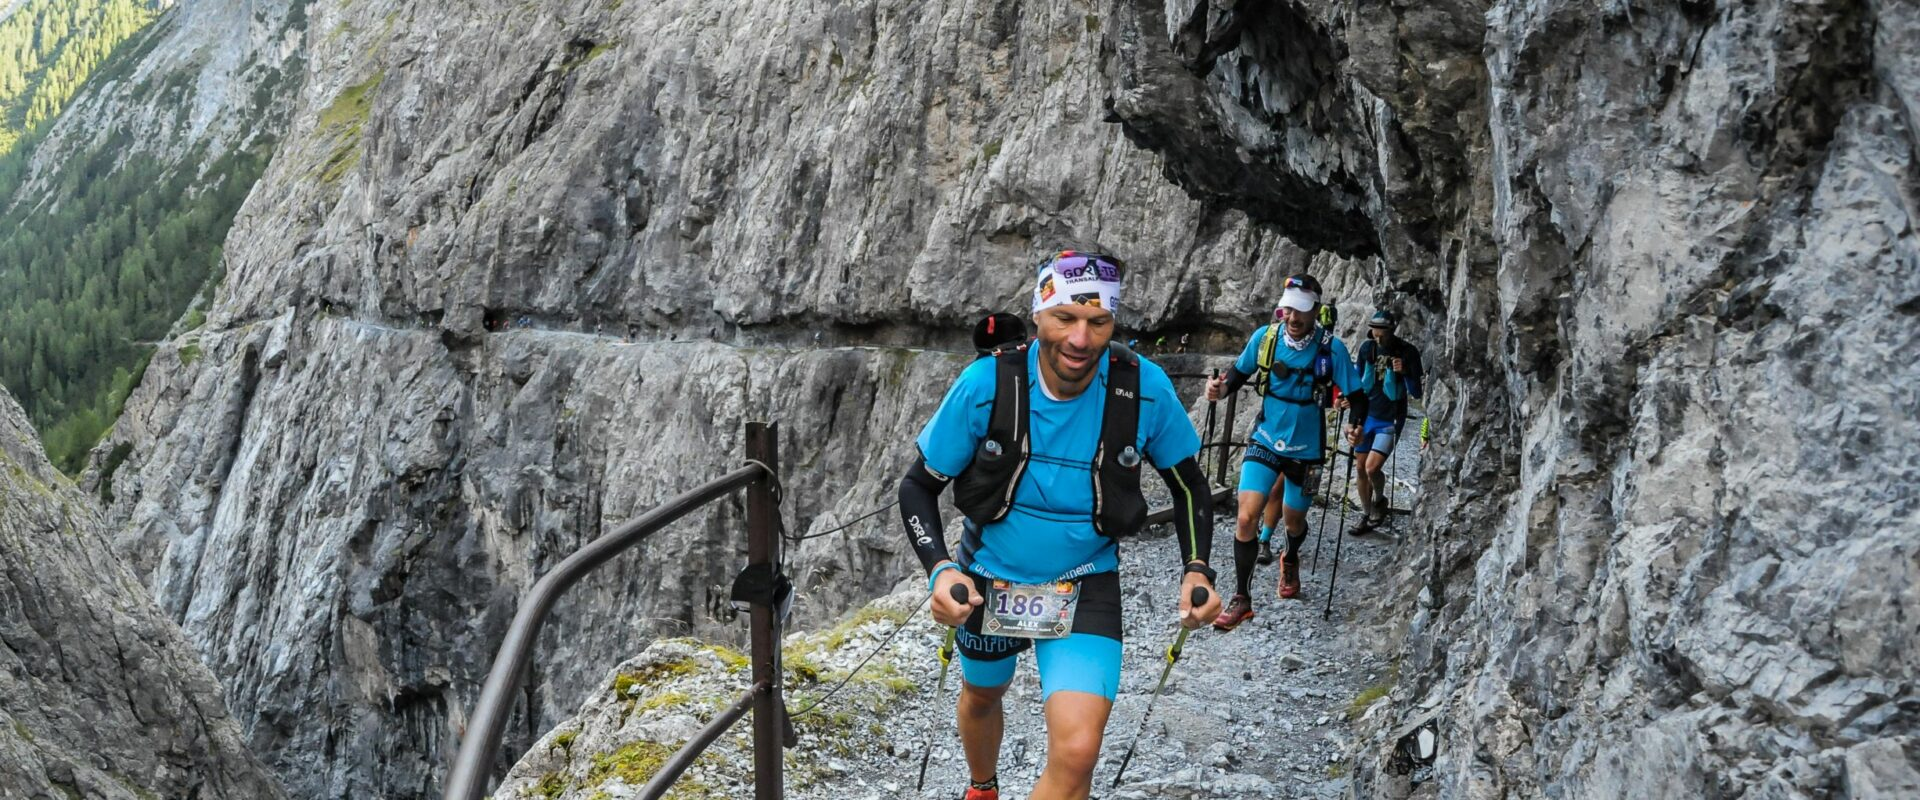 Trailrunning Wettkampf-Reisen